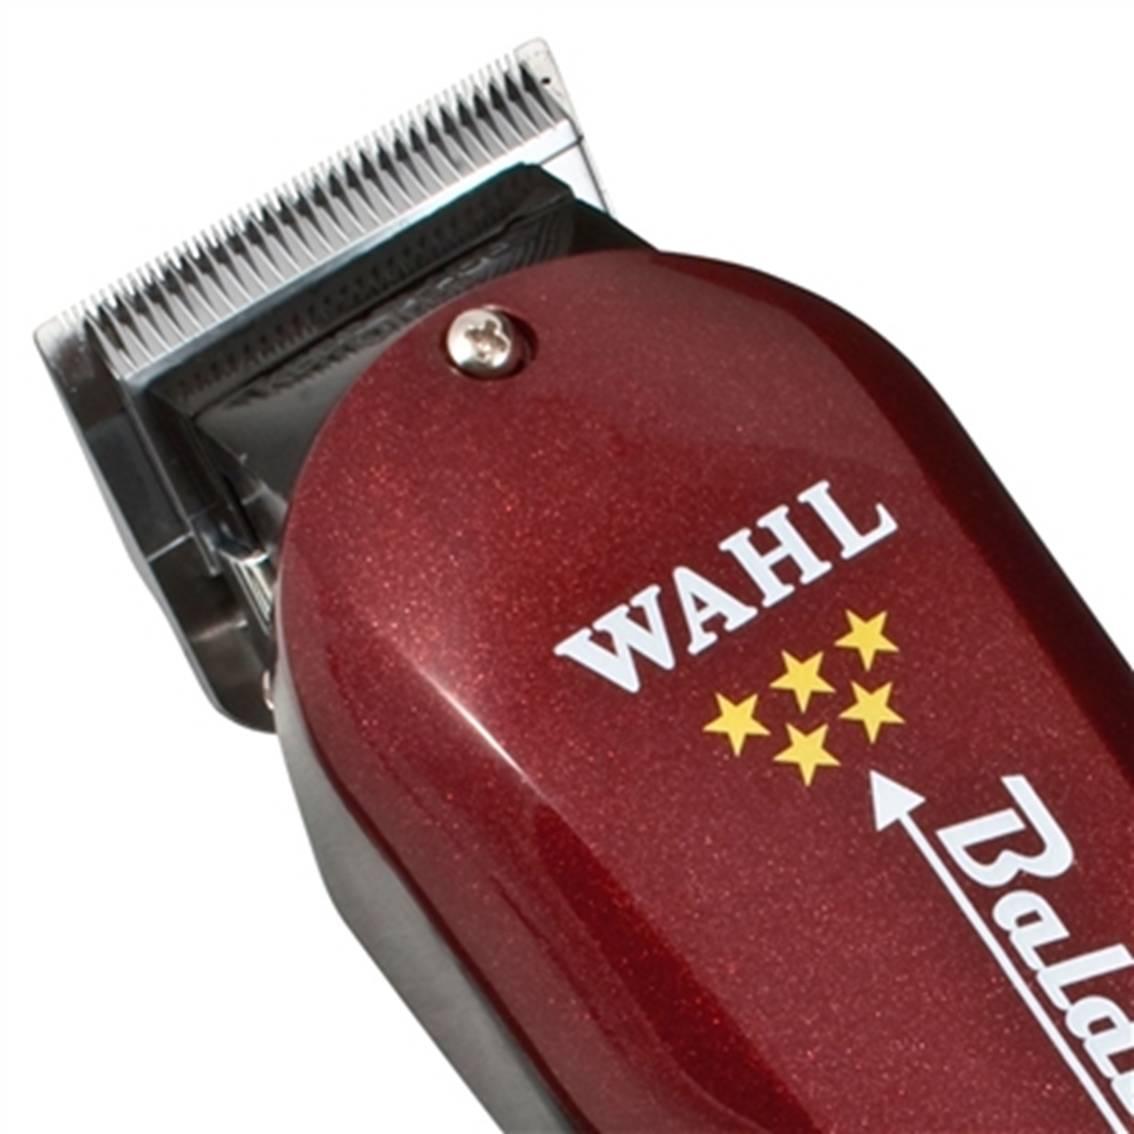 Máquina de corte Profissional V5000 - Wahl Balding Clipper 5 Stars Series 110v